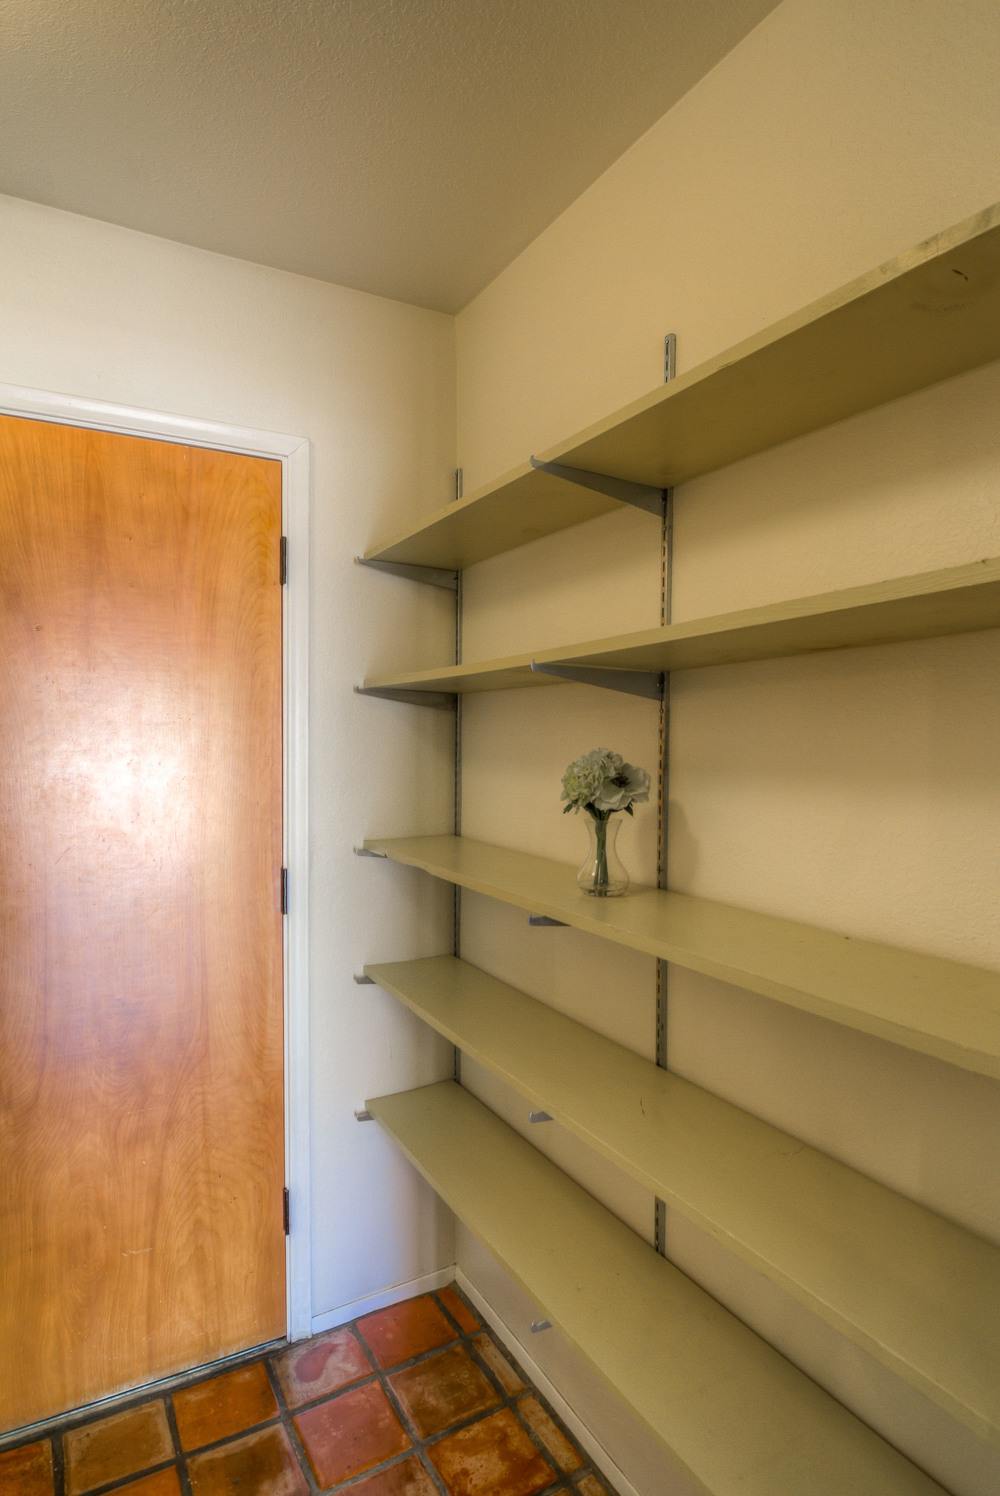 14 Laudnry Room photo a.jpg